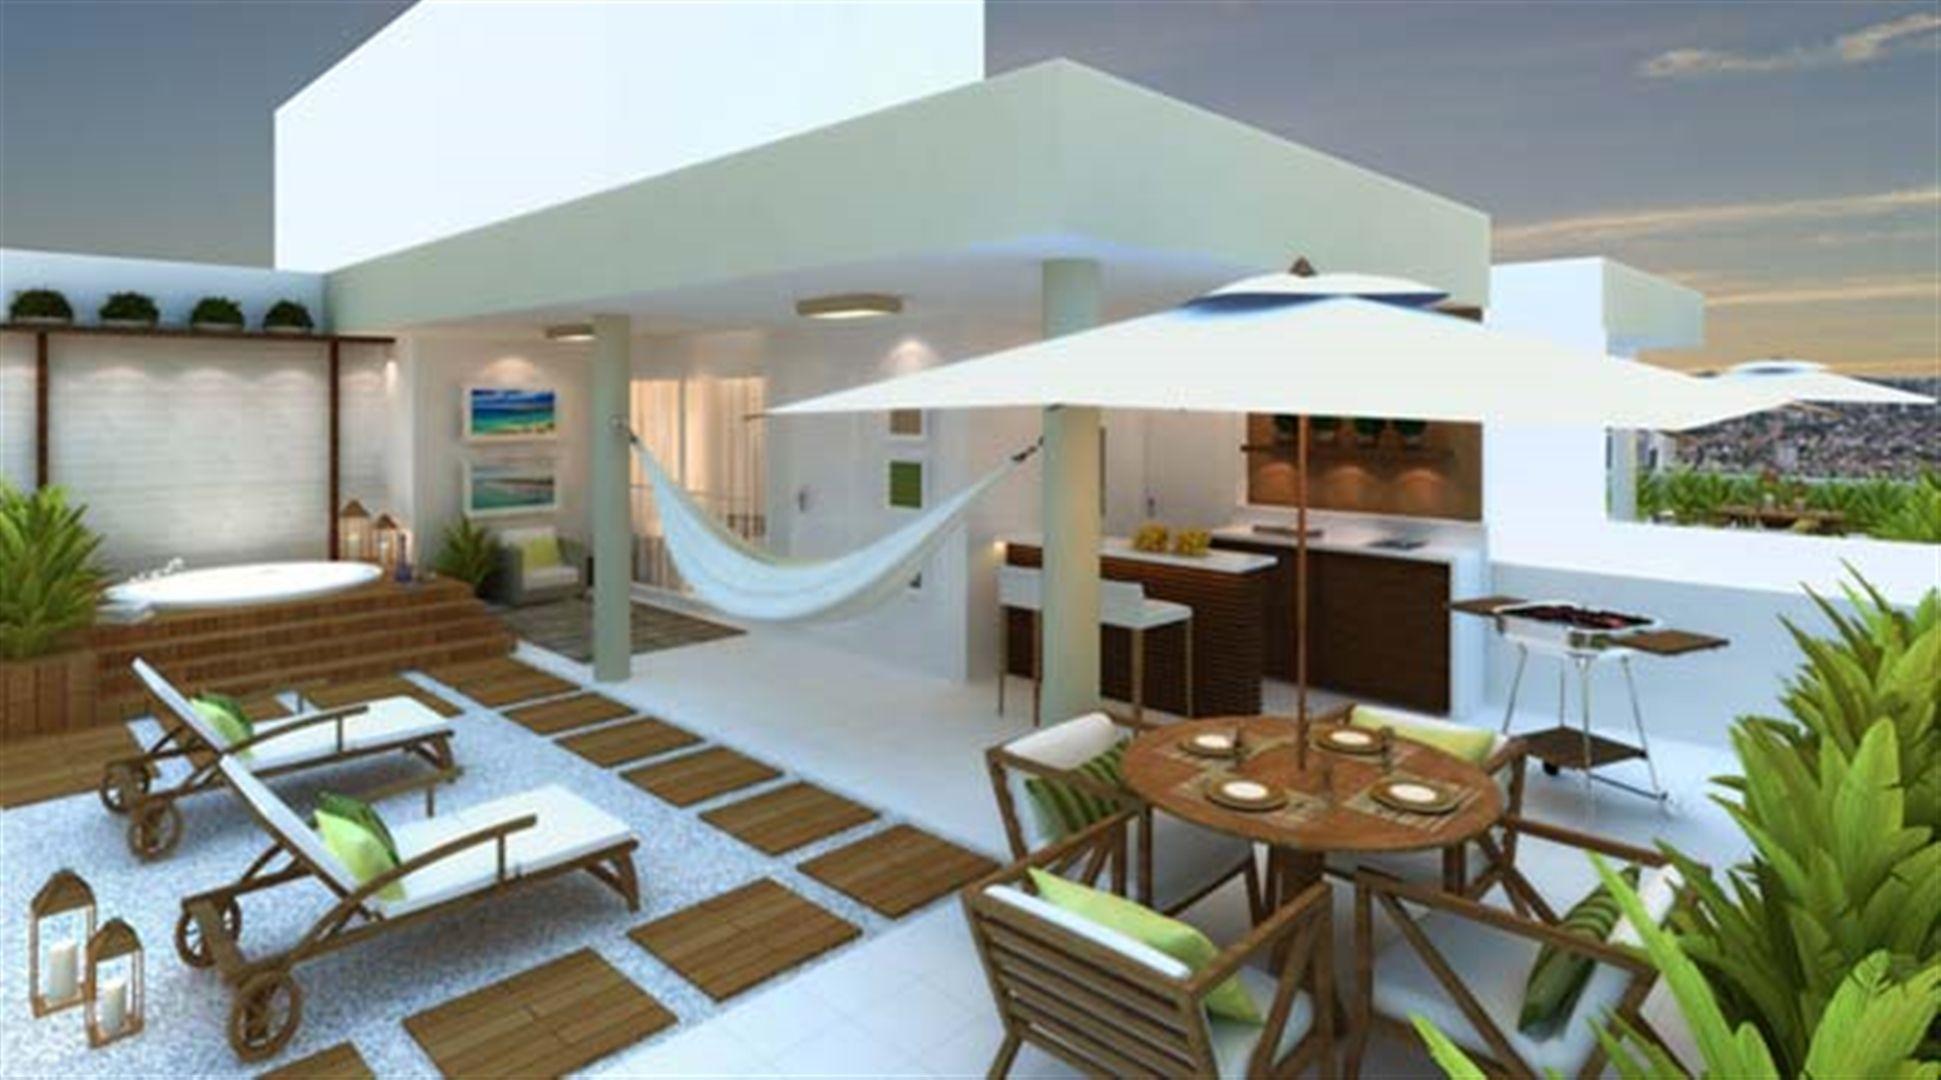 Varanda | Vita 2 Residencial Clube – Apartamentono  Pitimbu - Natal - Rio Grande do Norte